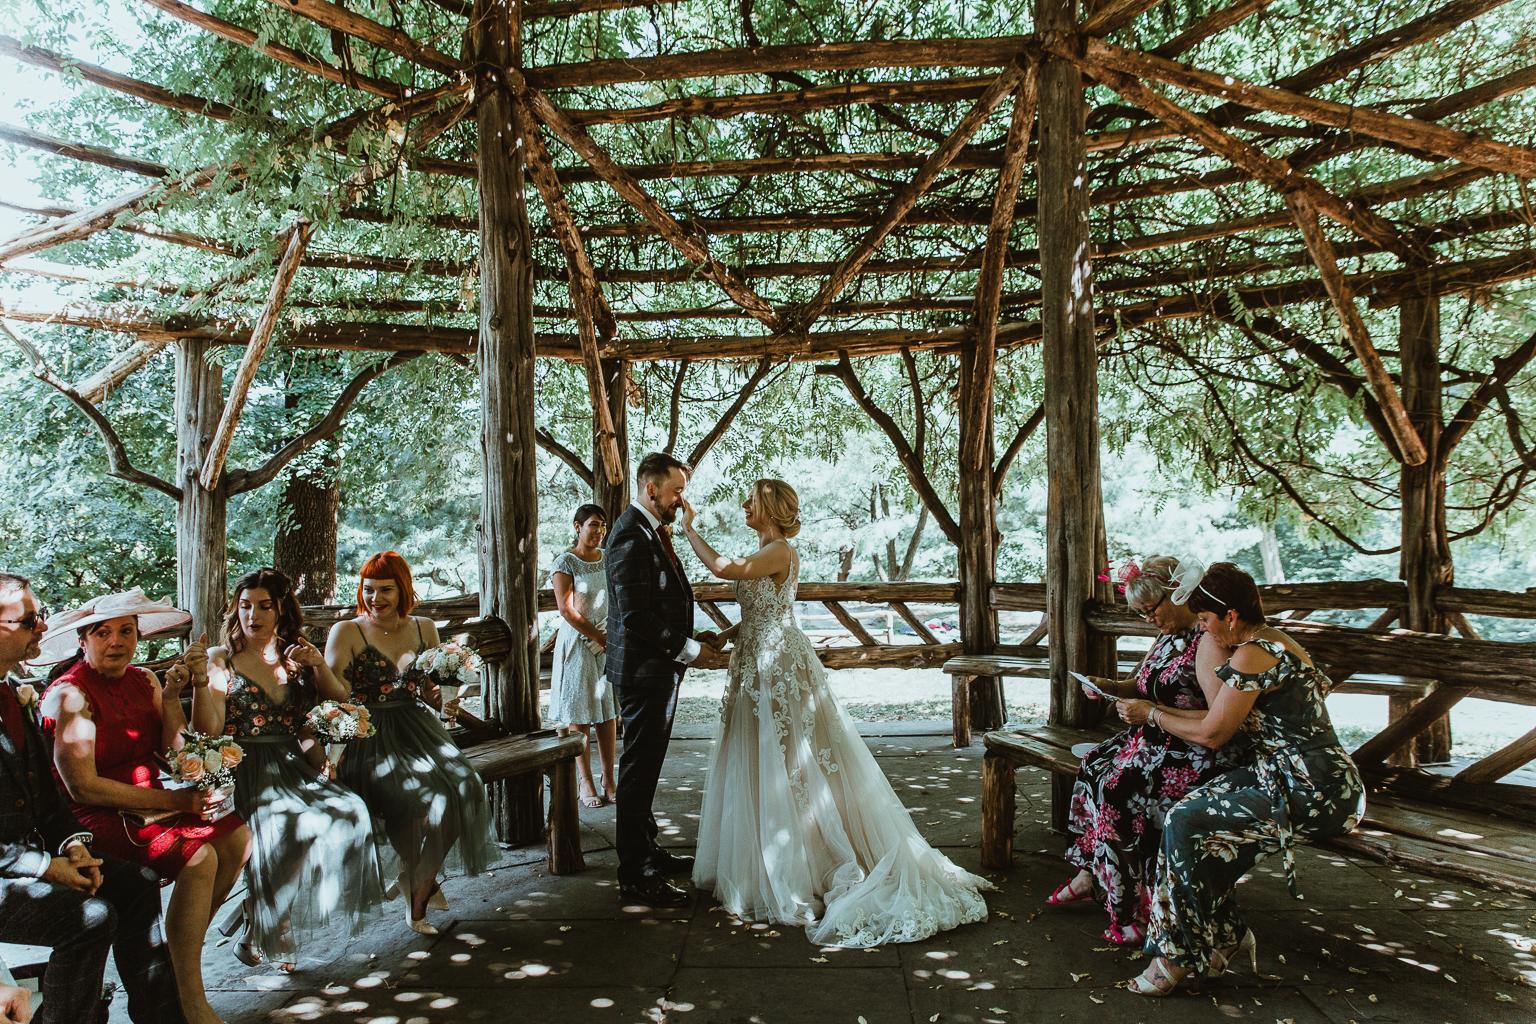 New York Manhattan Central Park Wedding Photographer-57.jpg